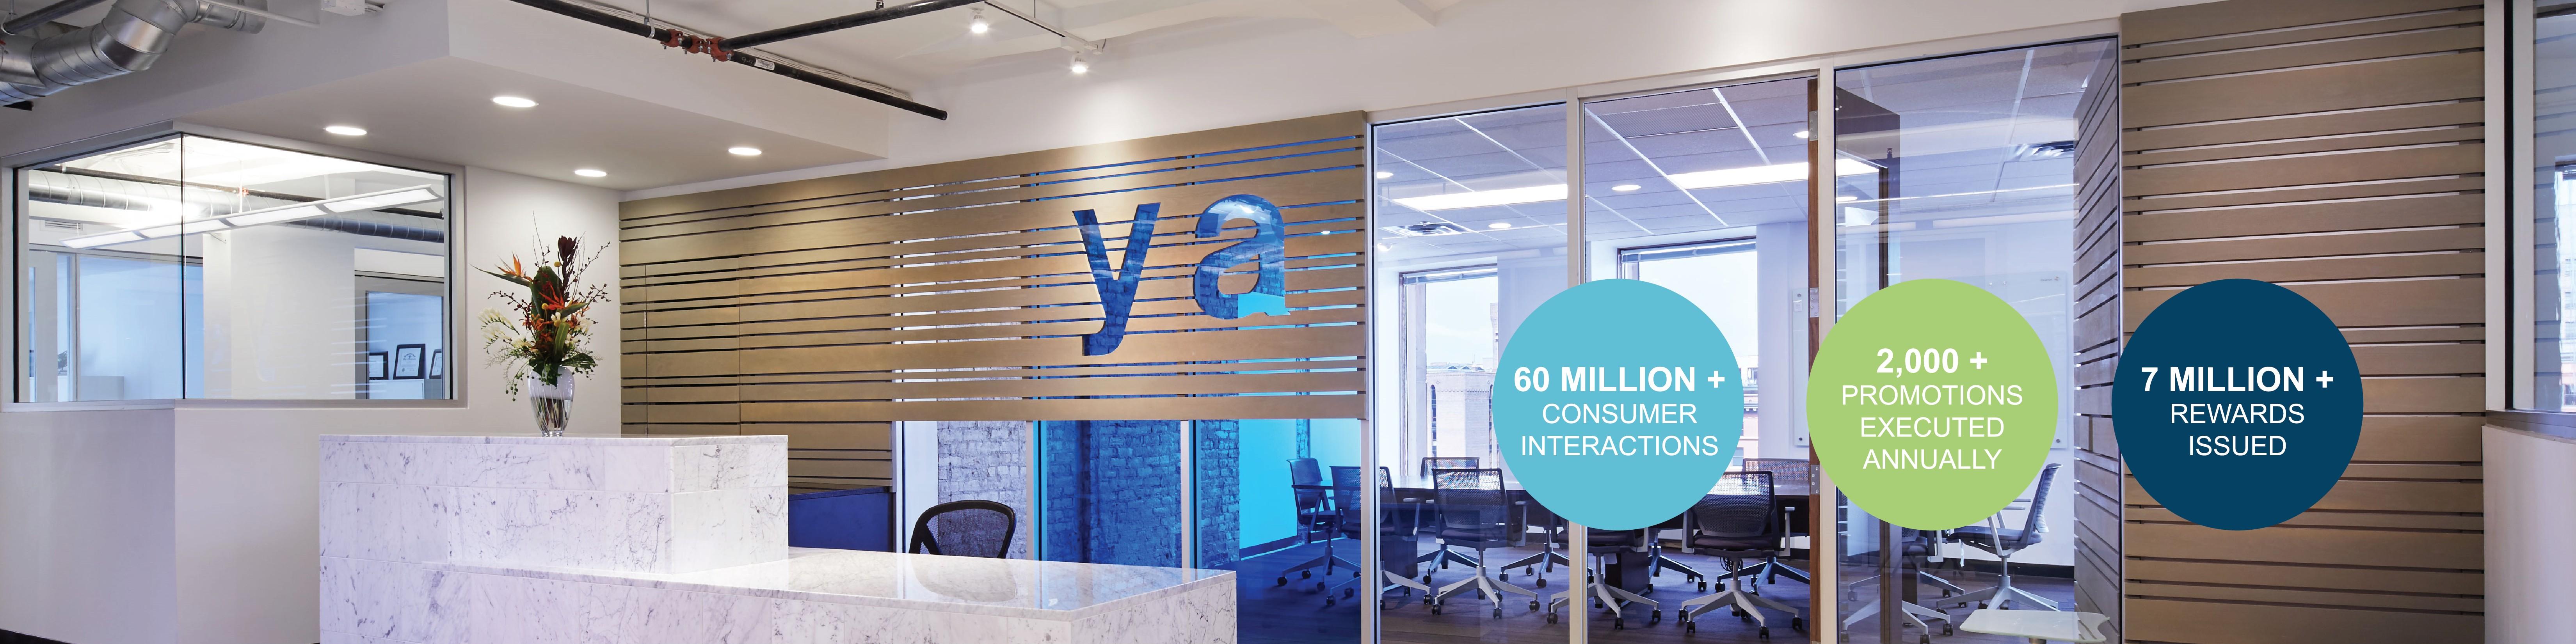 YA | Engage | LinkedIn